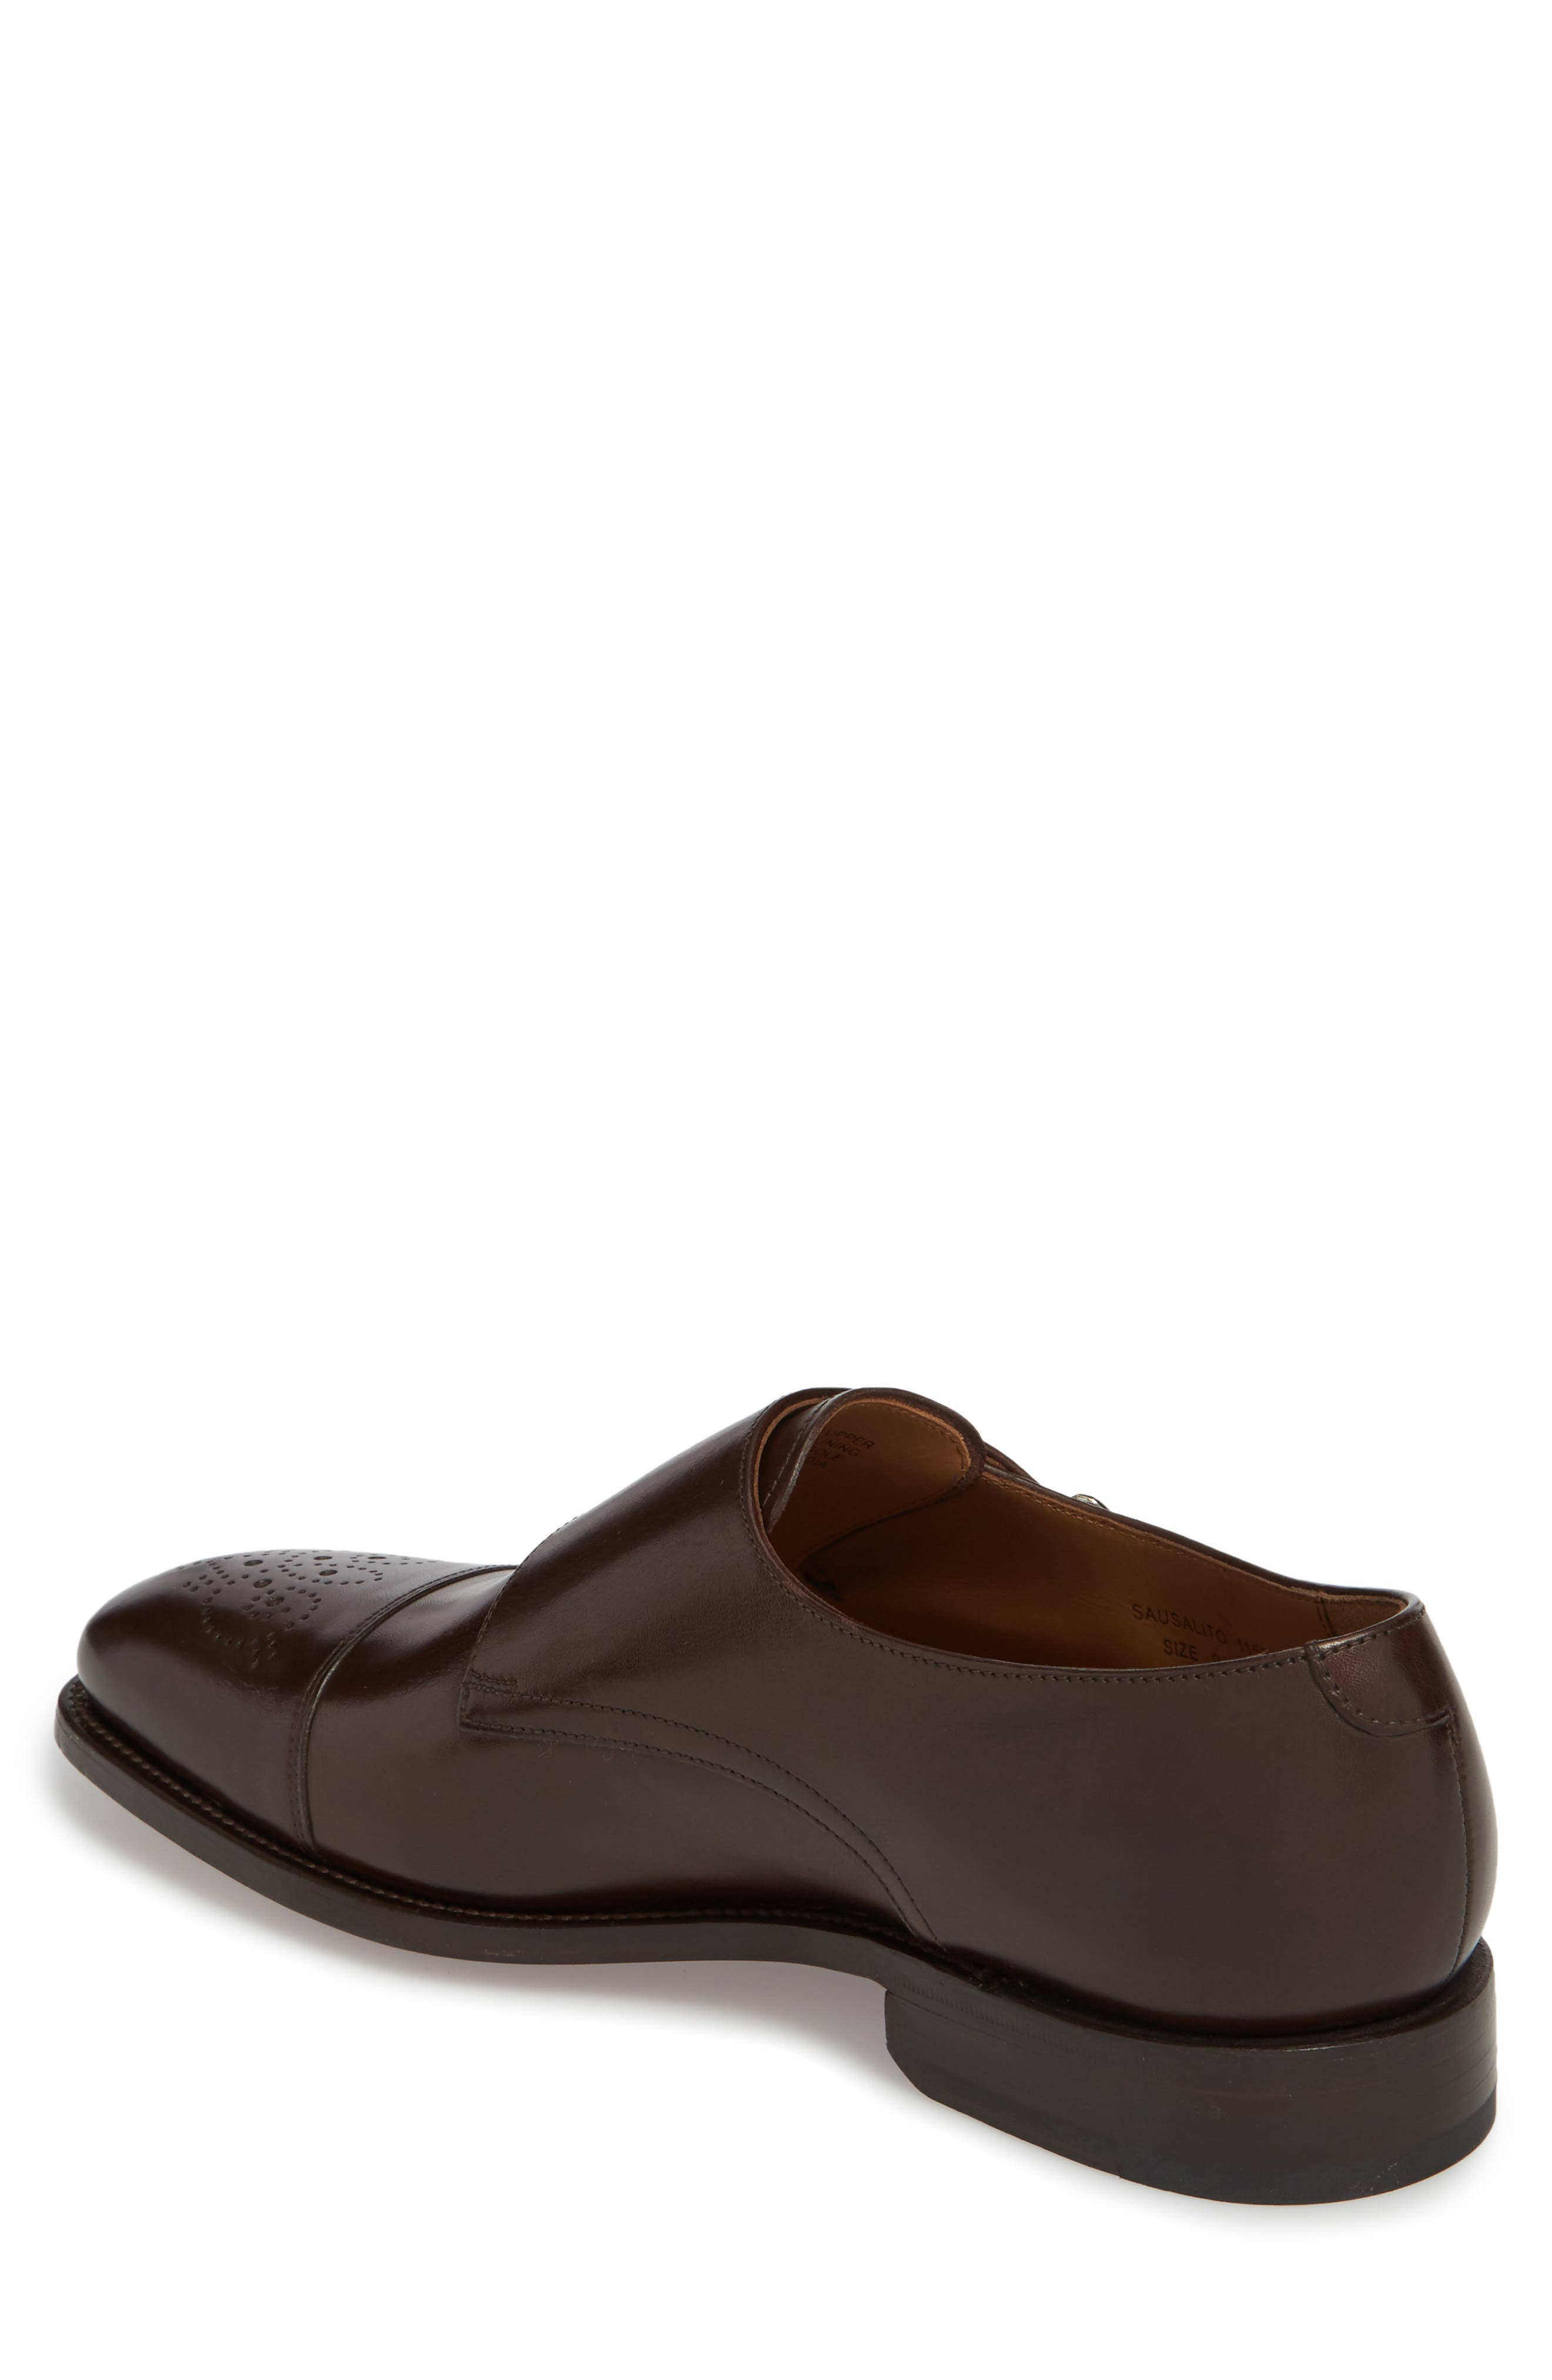 Sausalito Double Monk Strap Shoe,                             Alternate thumbnail 2, color,                             COFFEE